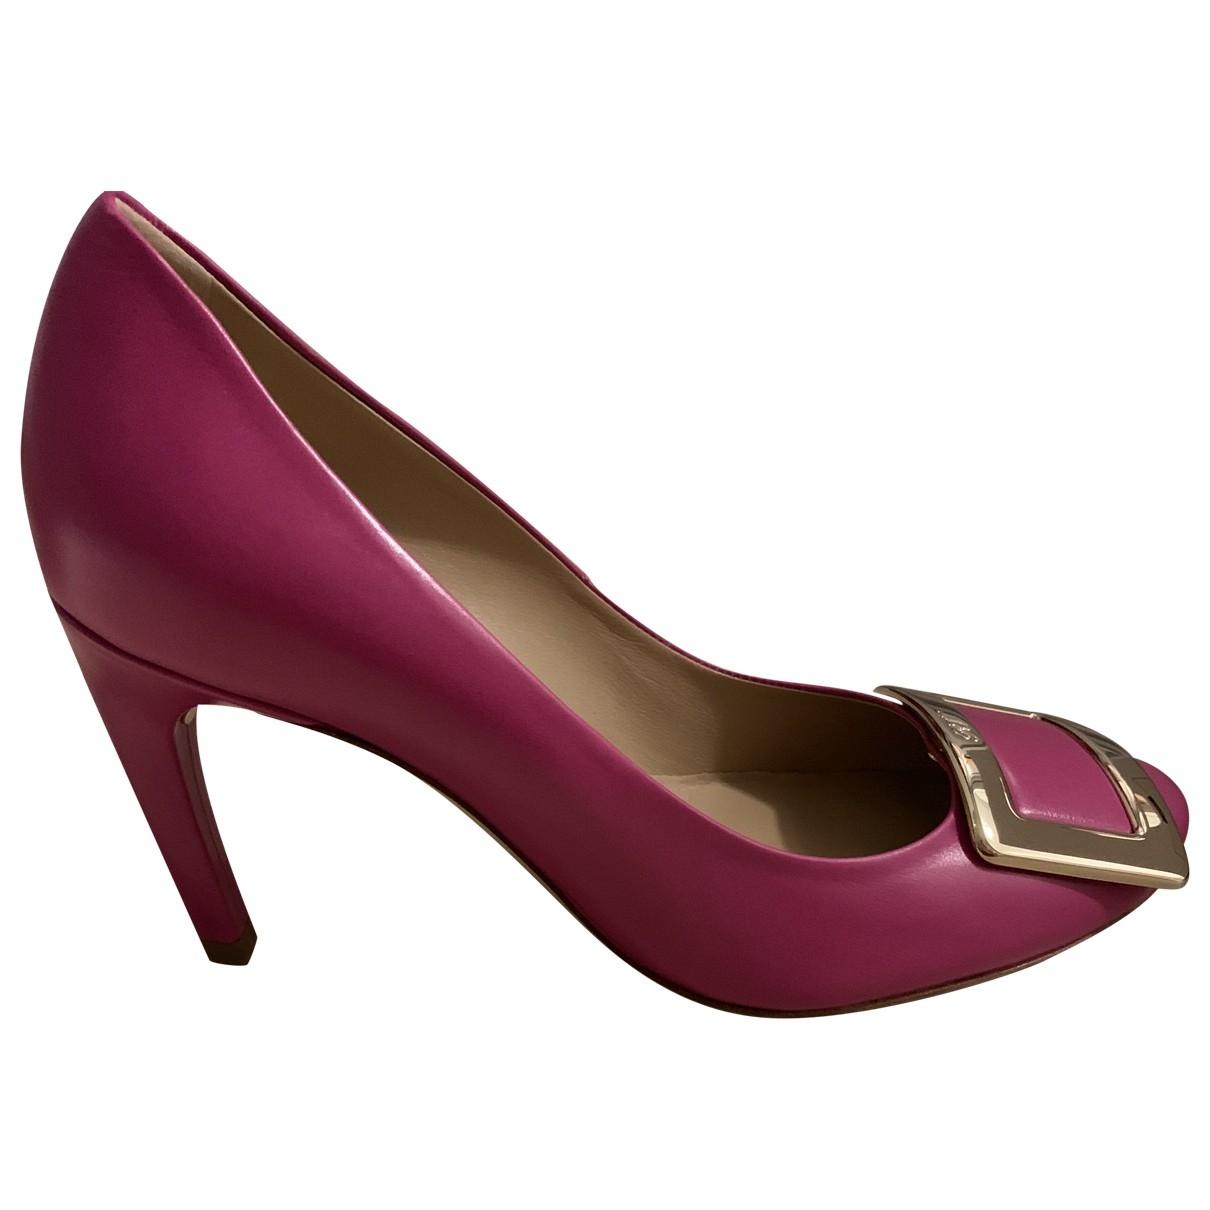 Roger Vivier Belle de Nuit Pink Leather Heels for Women 35.5 EU